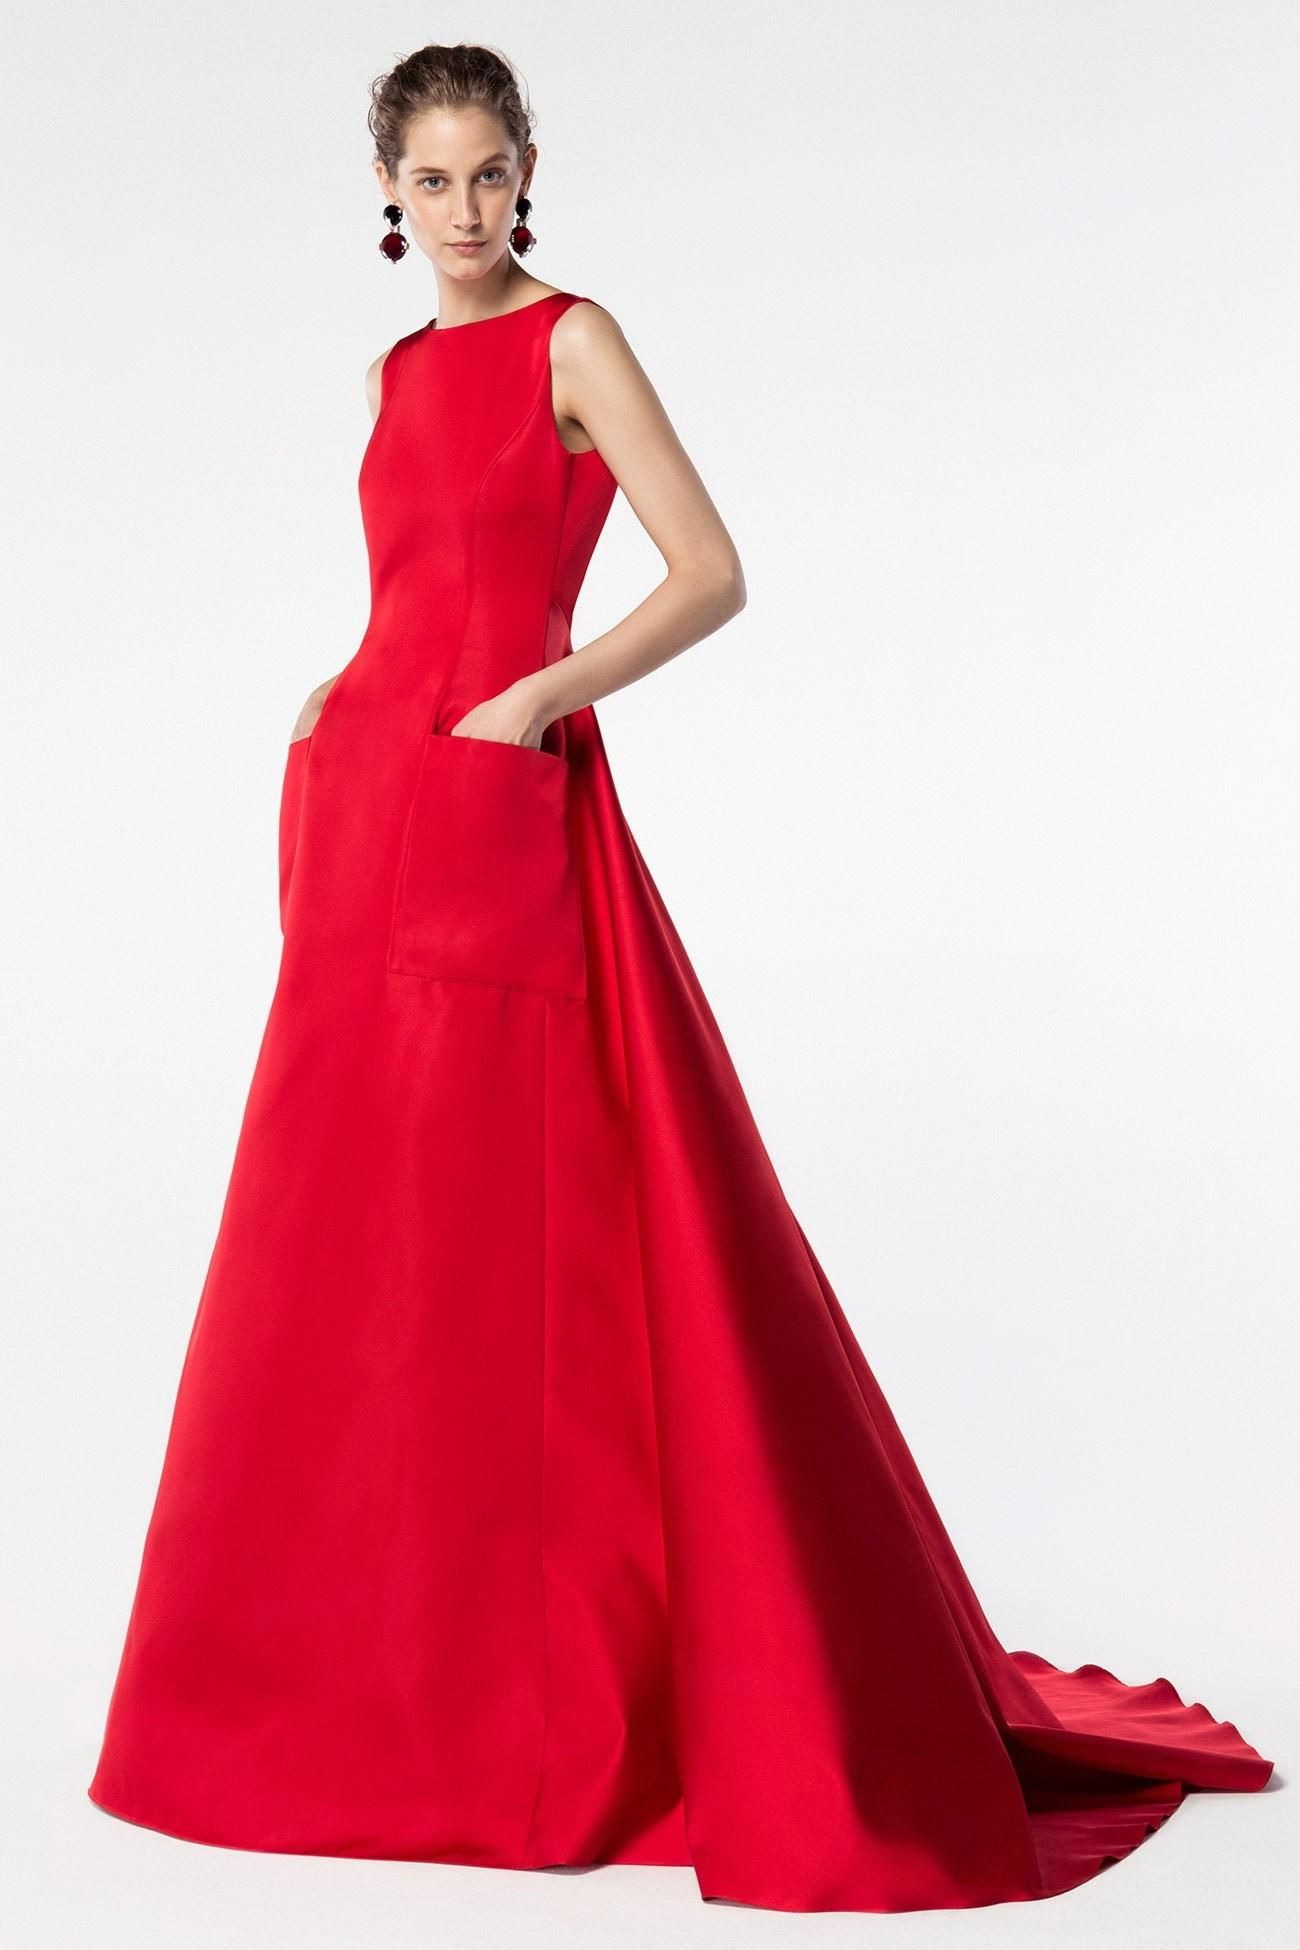 Ch Carolina Herrera Dress As Seen On Lily Aldridge | Rote